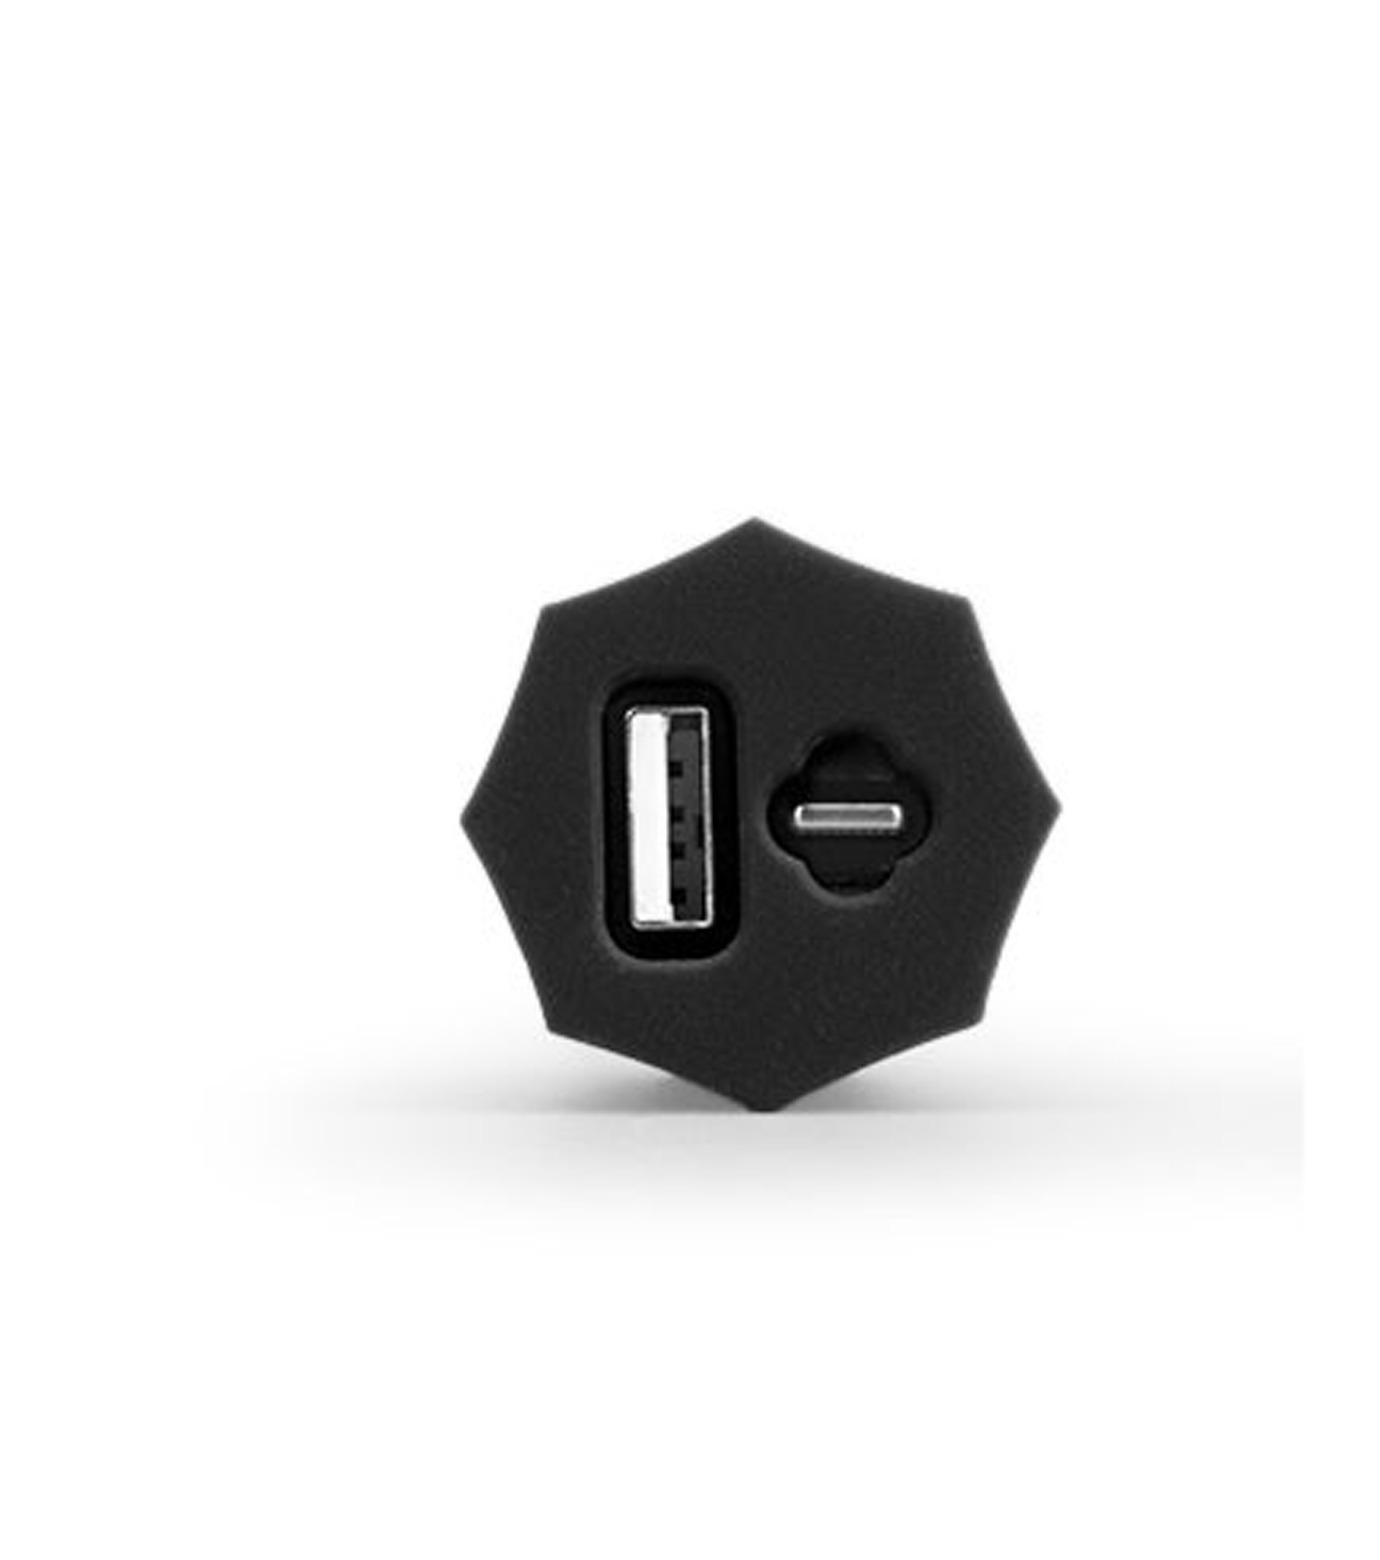 Tunewear(チューンウエア)のCableArt Lantern-BLACK(ガジェット/gadgets)-TUN-OT-0022-13 拡大詳細画像2